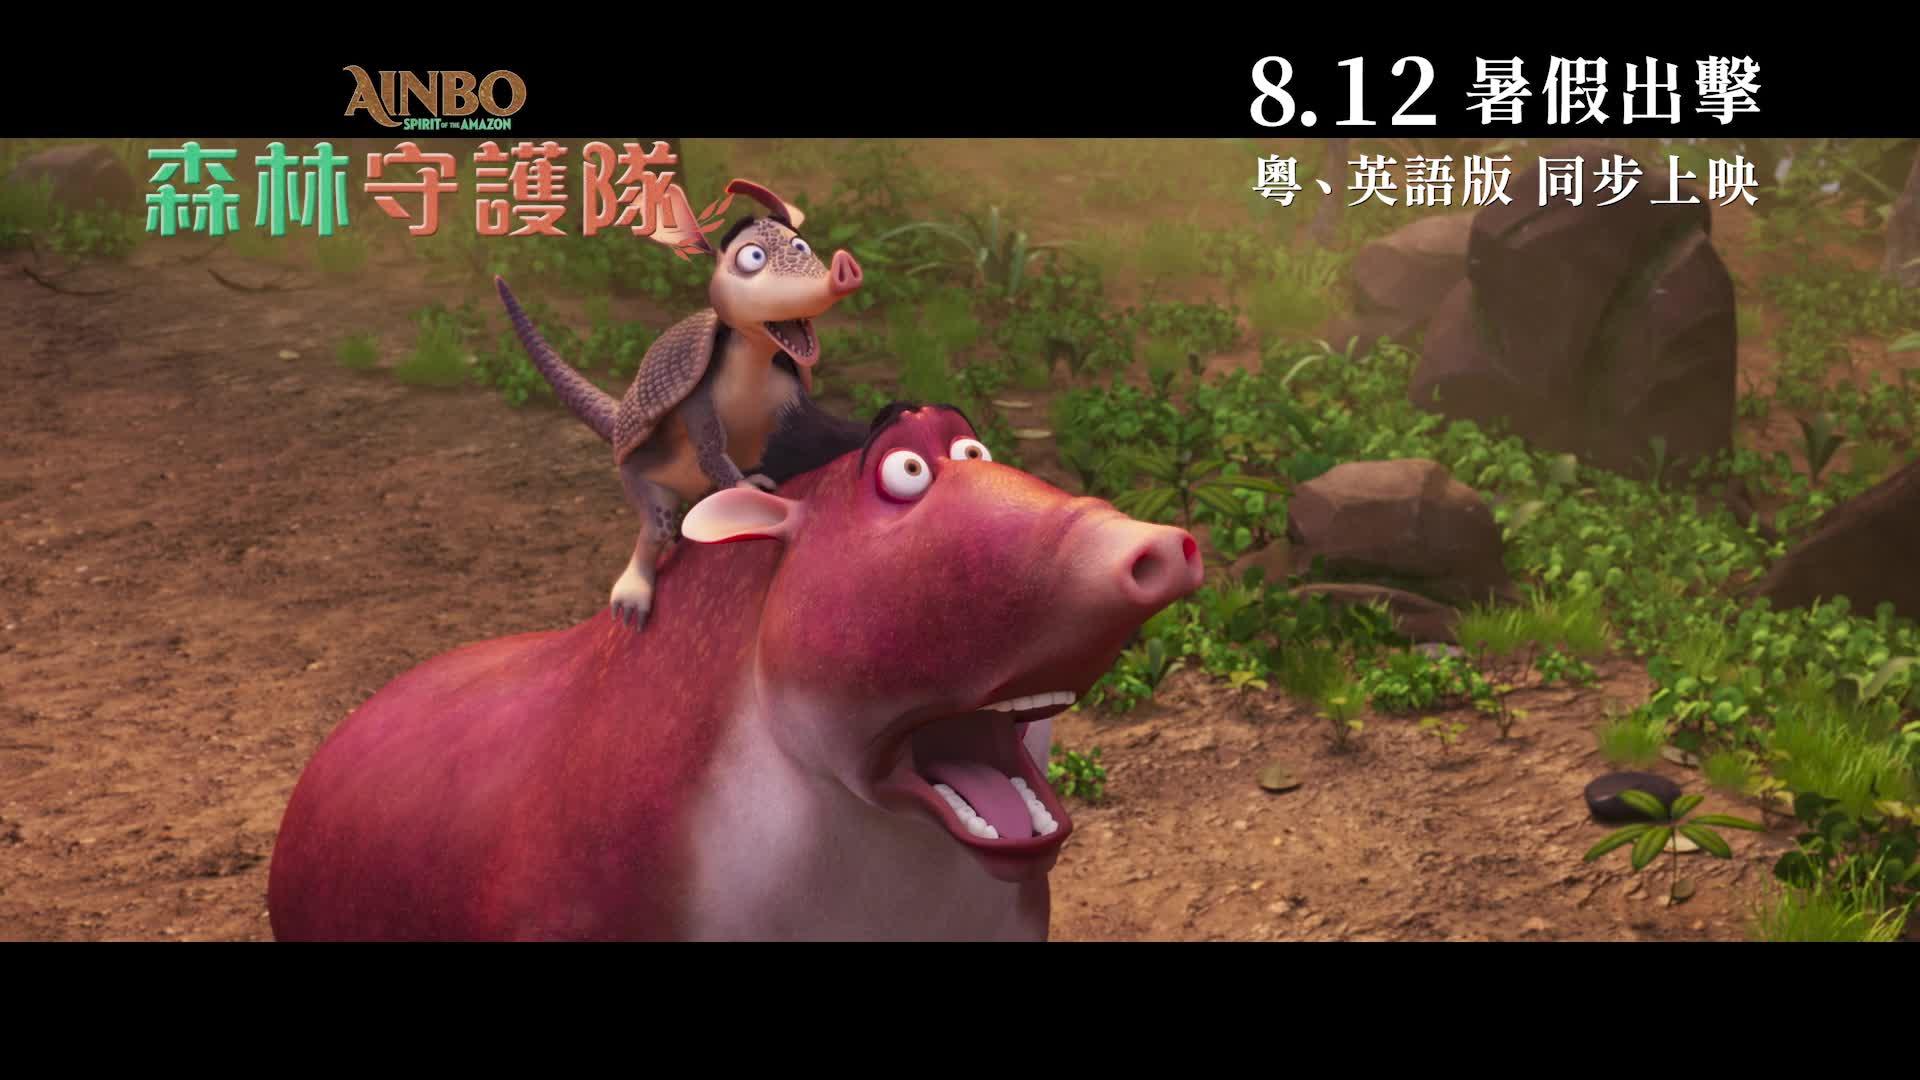 《Ainbo 森林守護隊》電影預告